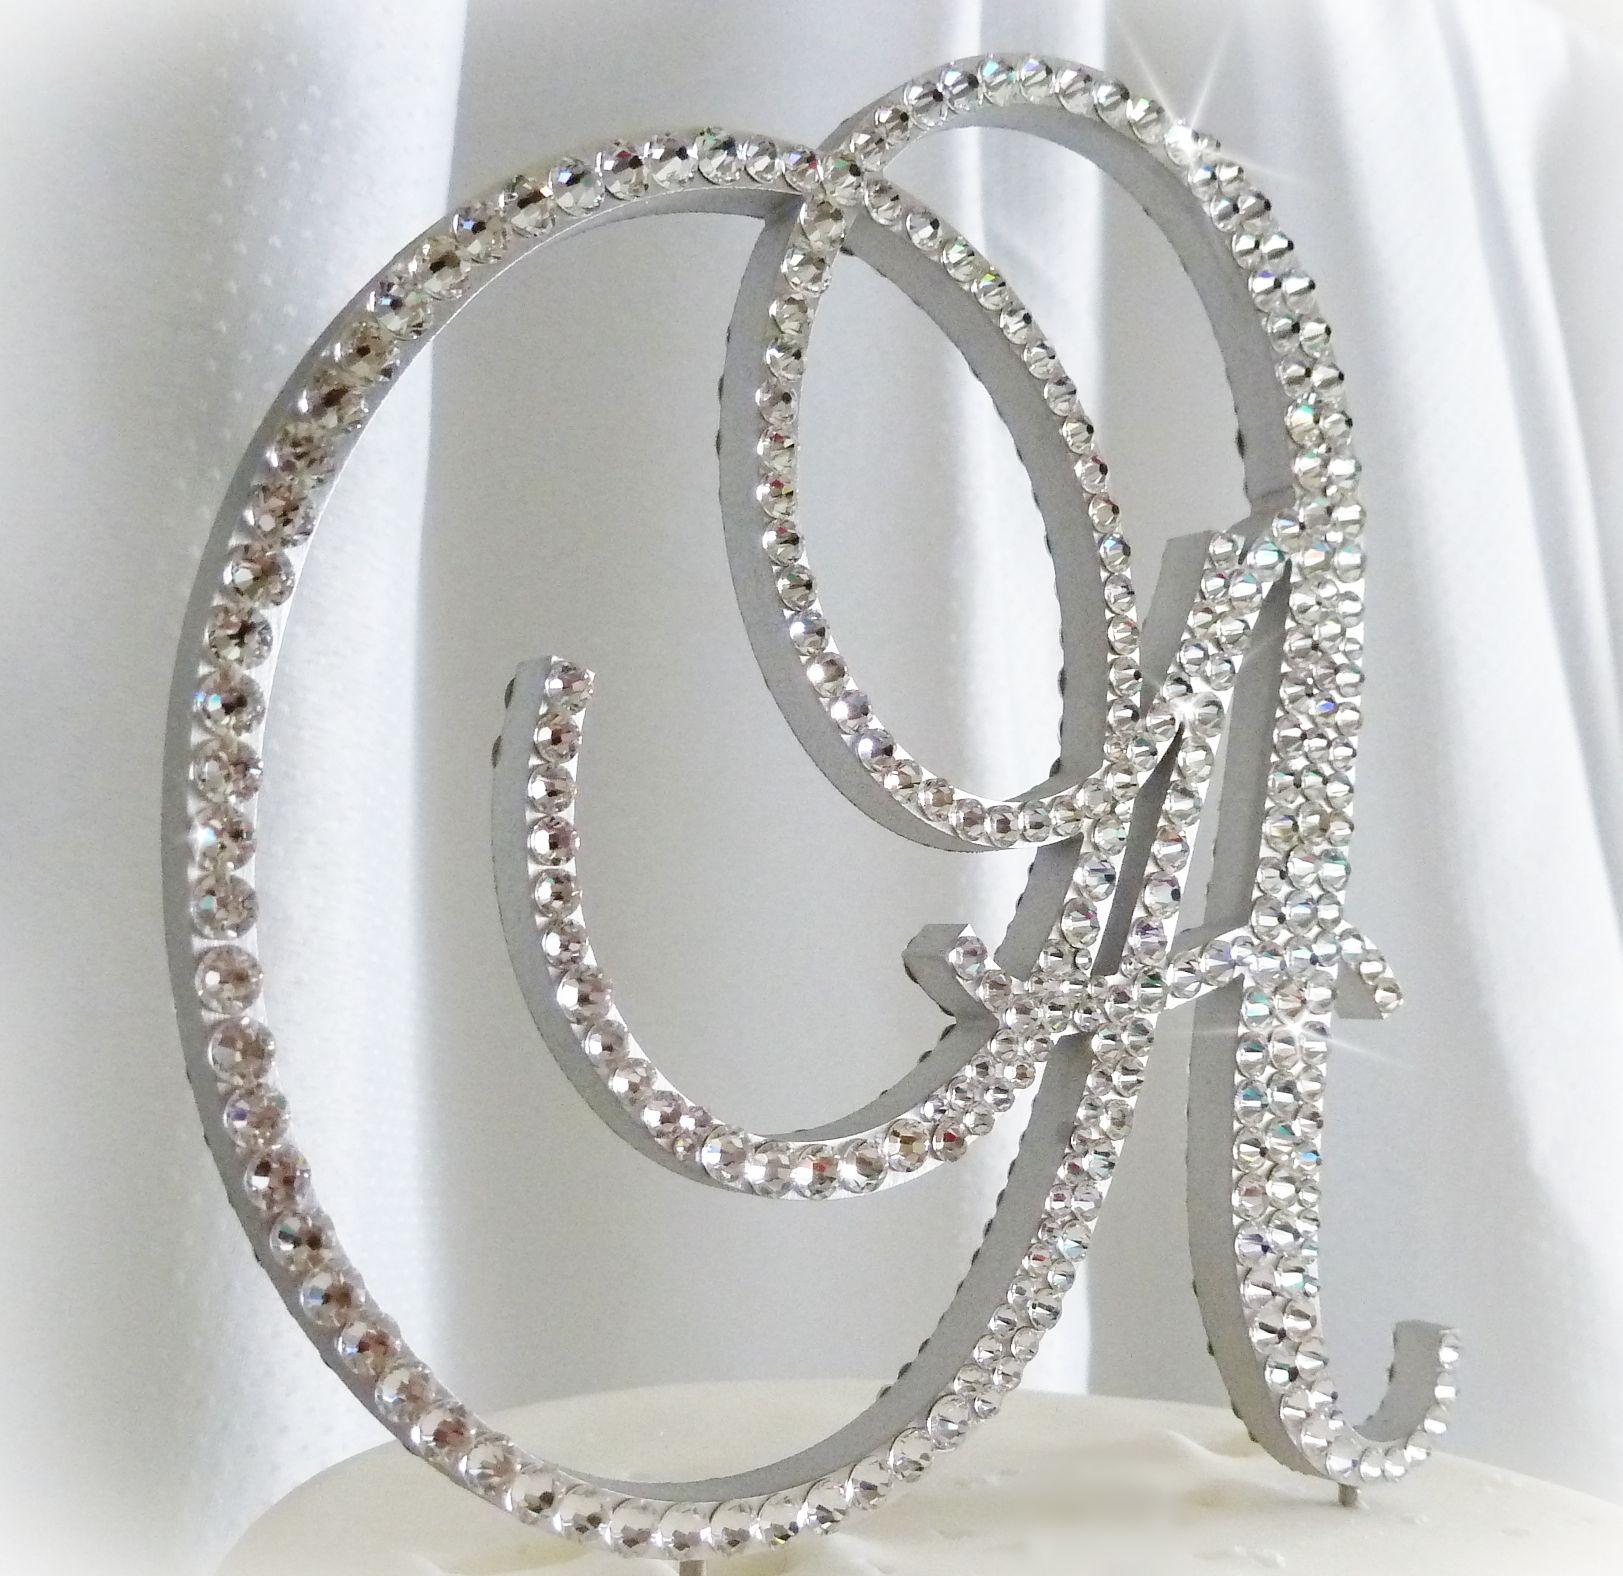 crystal wedding cake toppers | Swarovski Crystal Monogram Cake ...